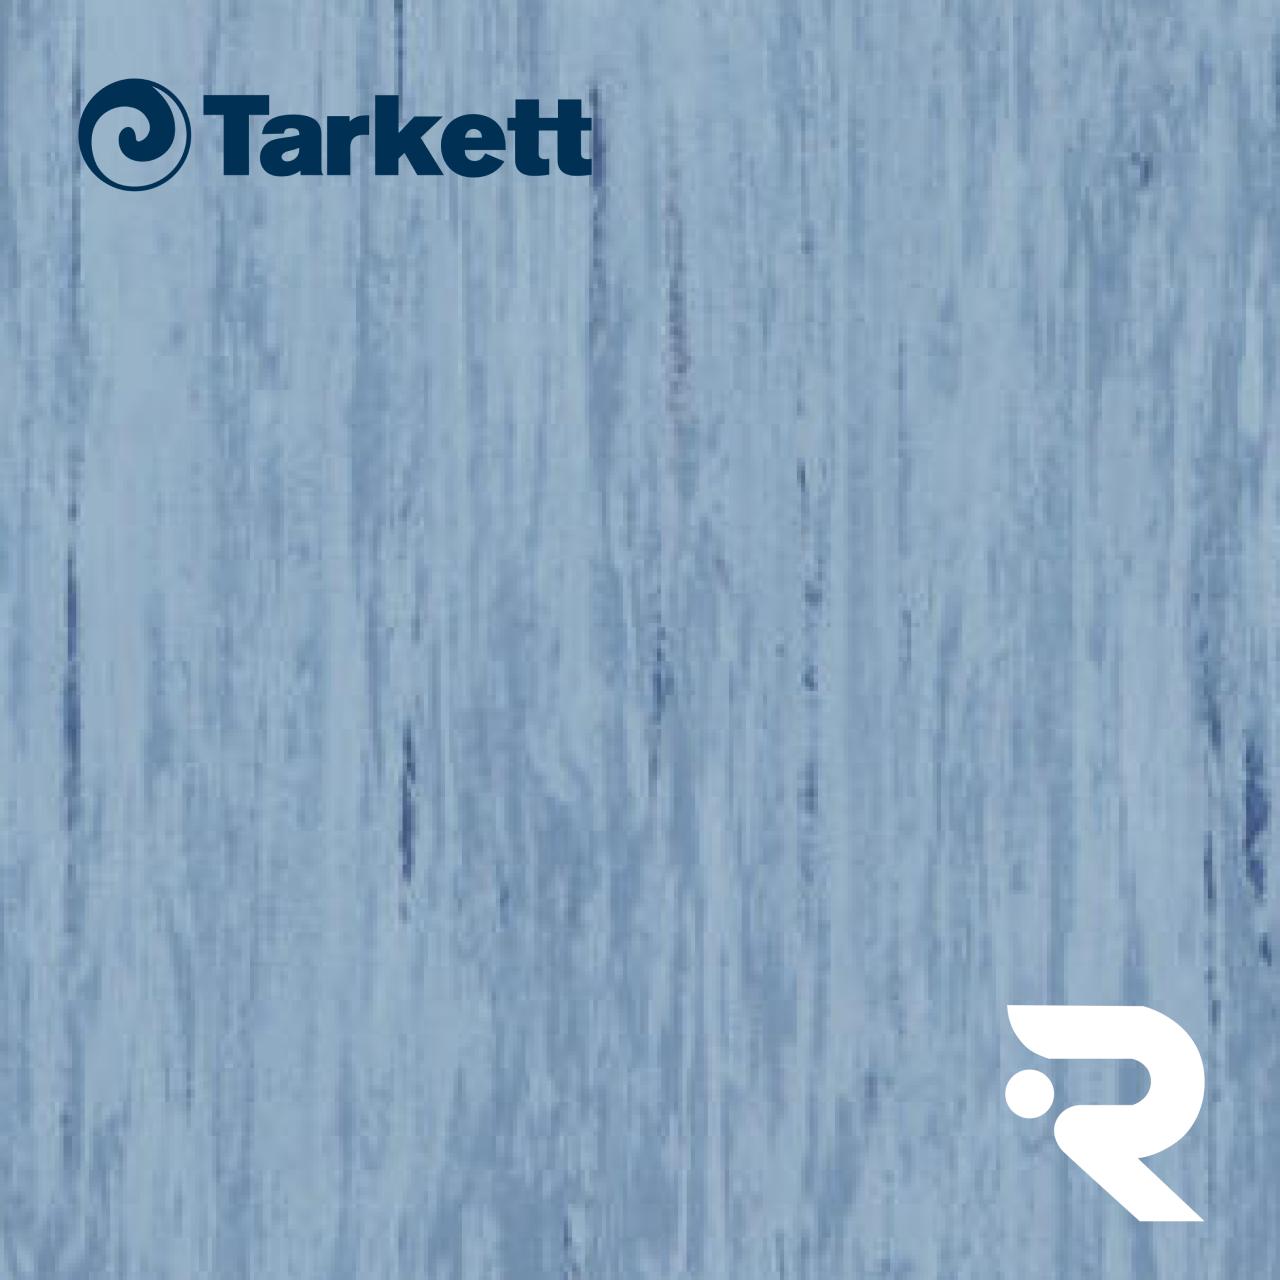 🏫 Гомогенный линолеум Tarkett   Standard MEDIUM BLUE 0492   Standard Plus 2.0 mm   2 х 23 м